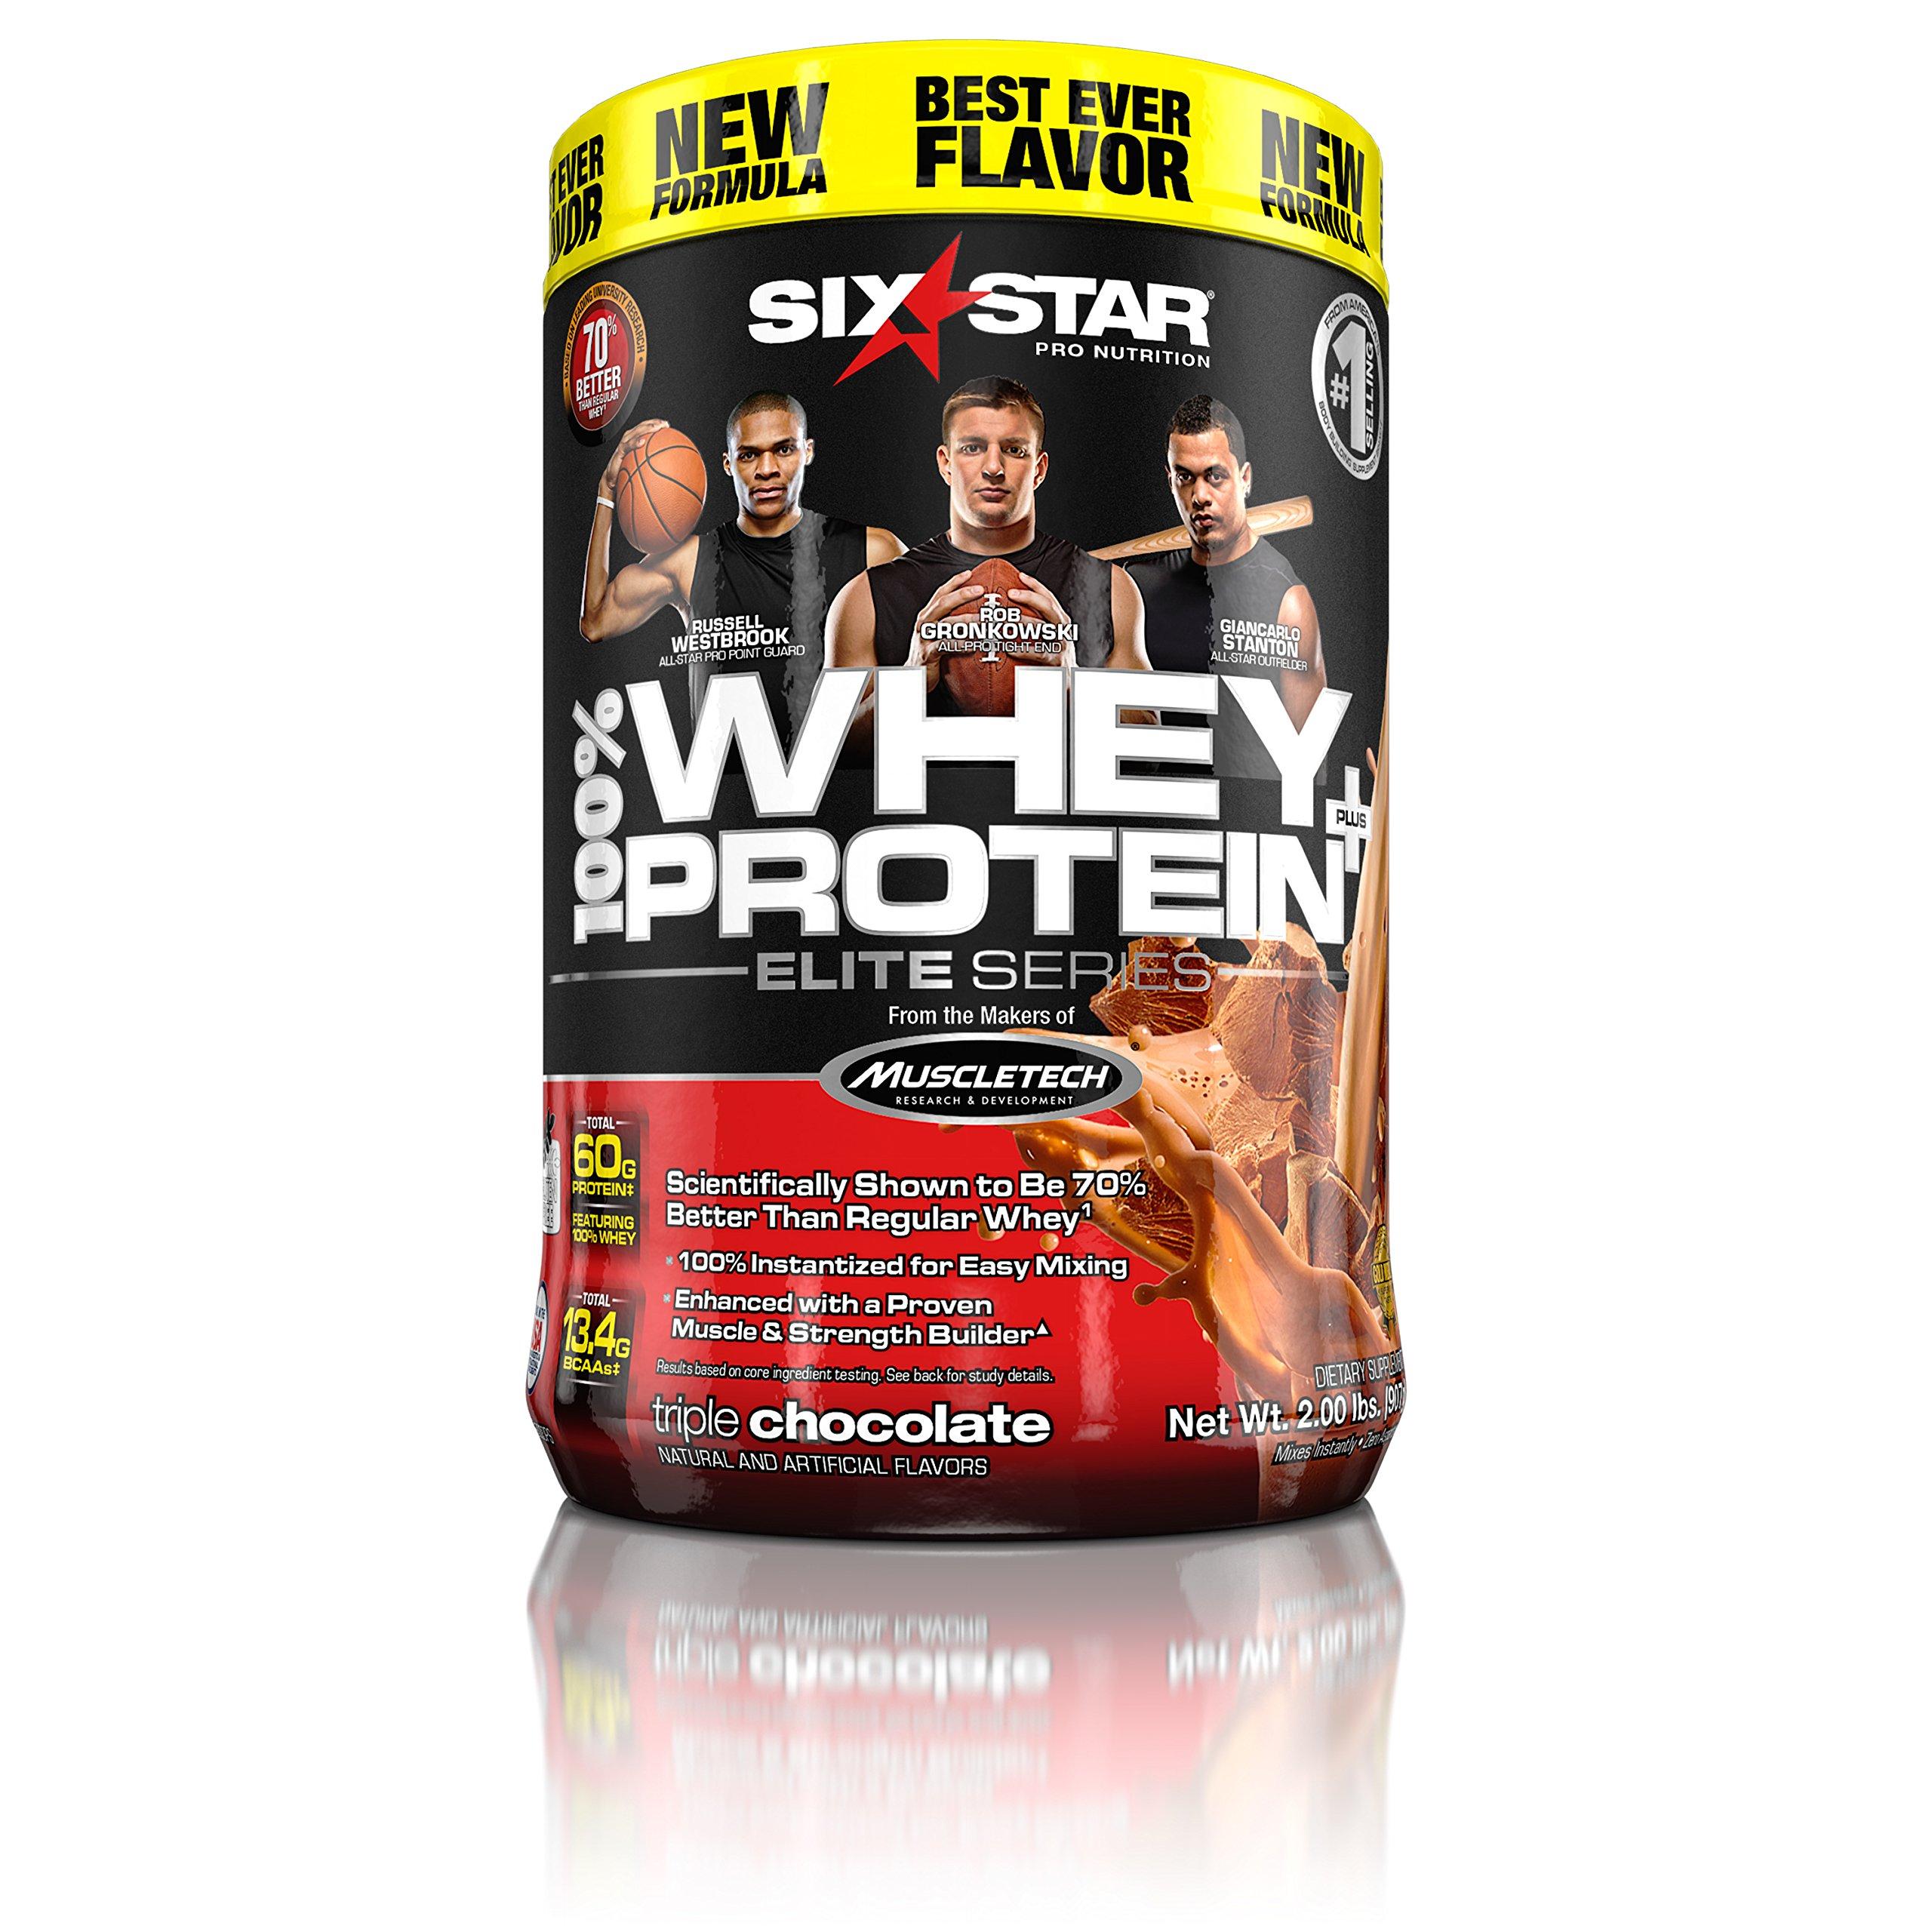 Six Star Pro Nutrition 100% Whey Protein Plus, Whey Protein Powder, Triple Chocolate, 2 Pound